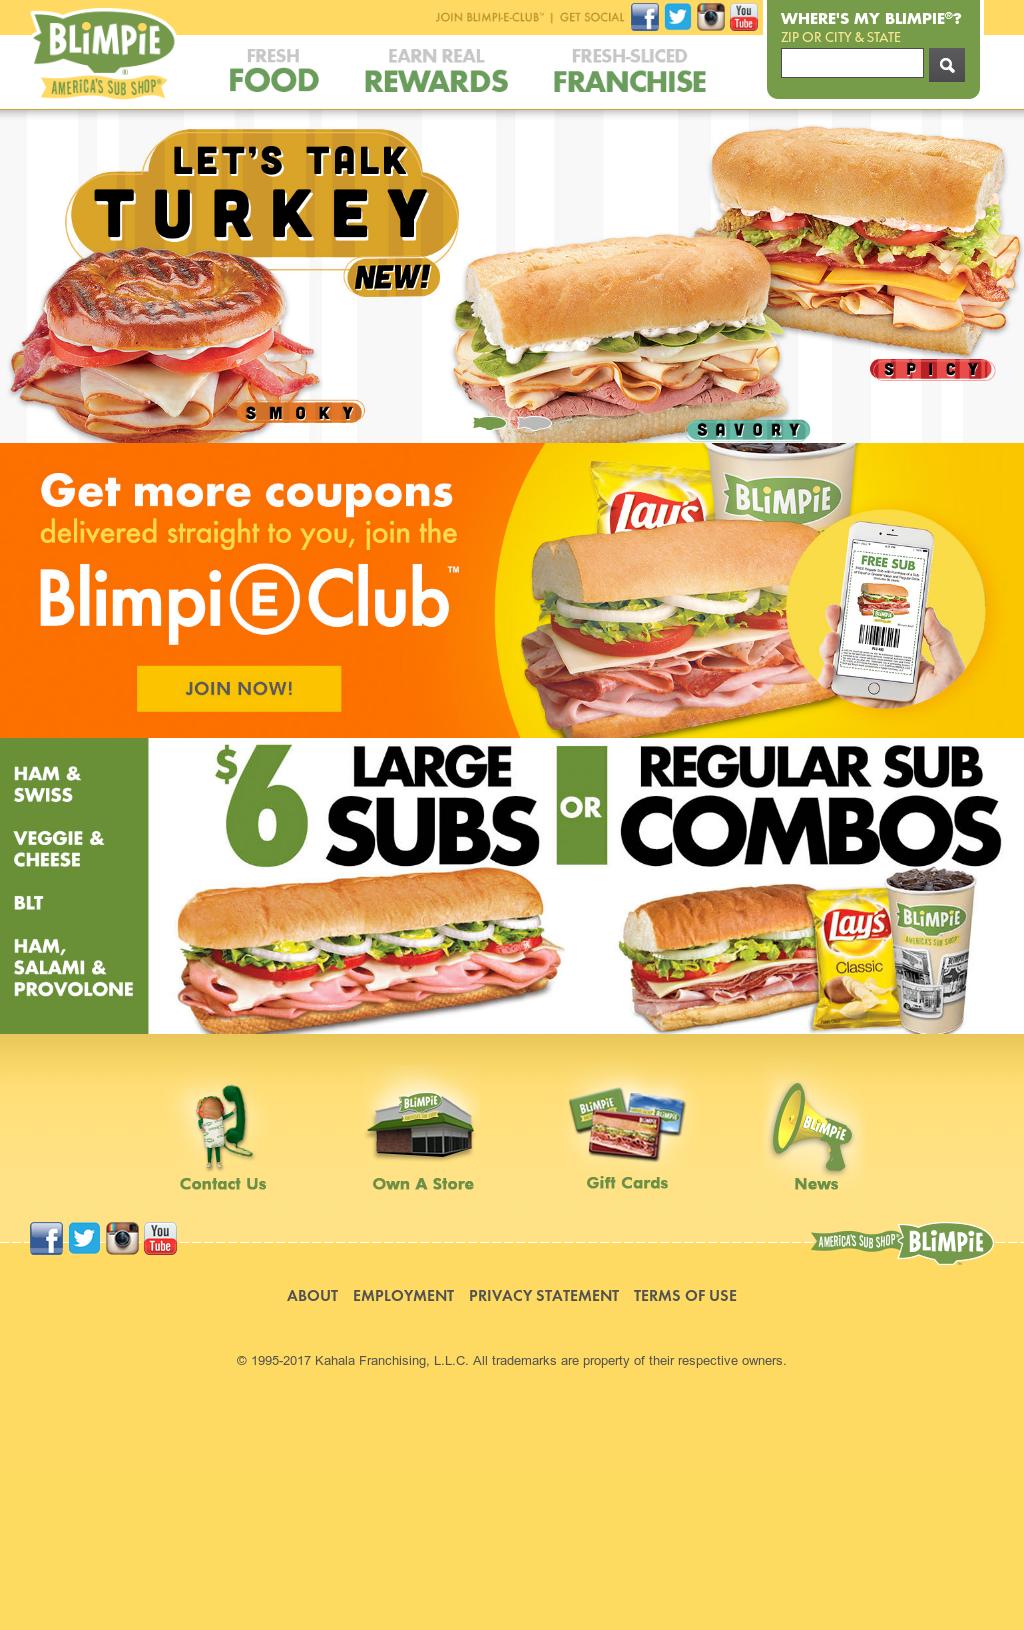 blimpie vs subway